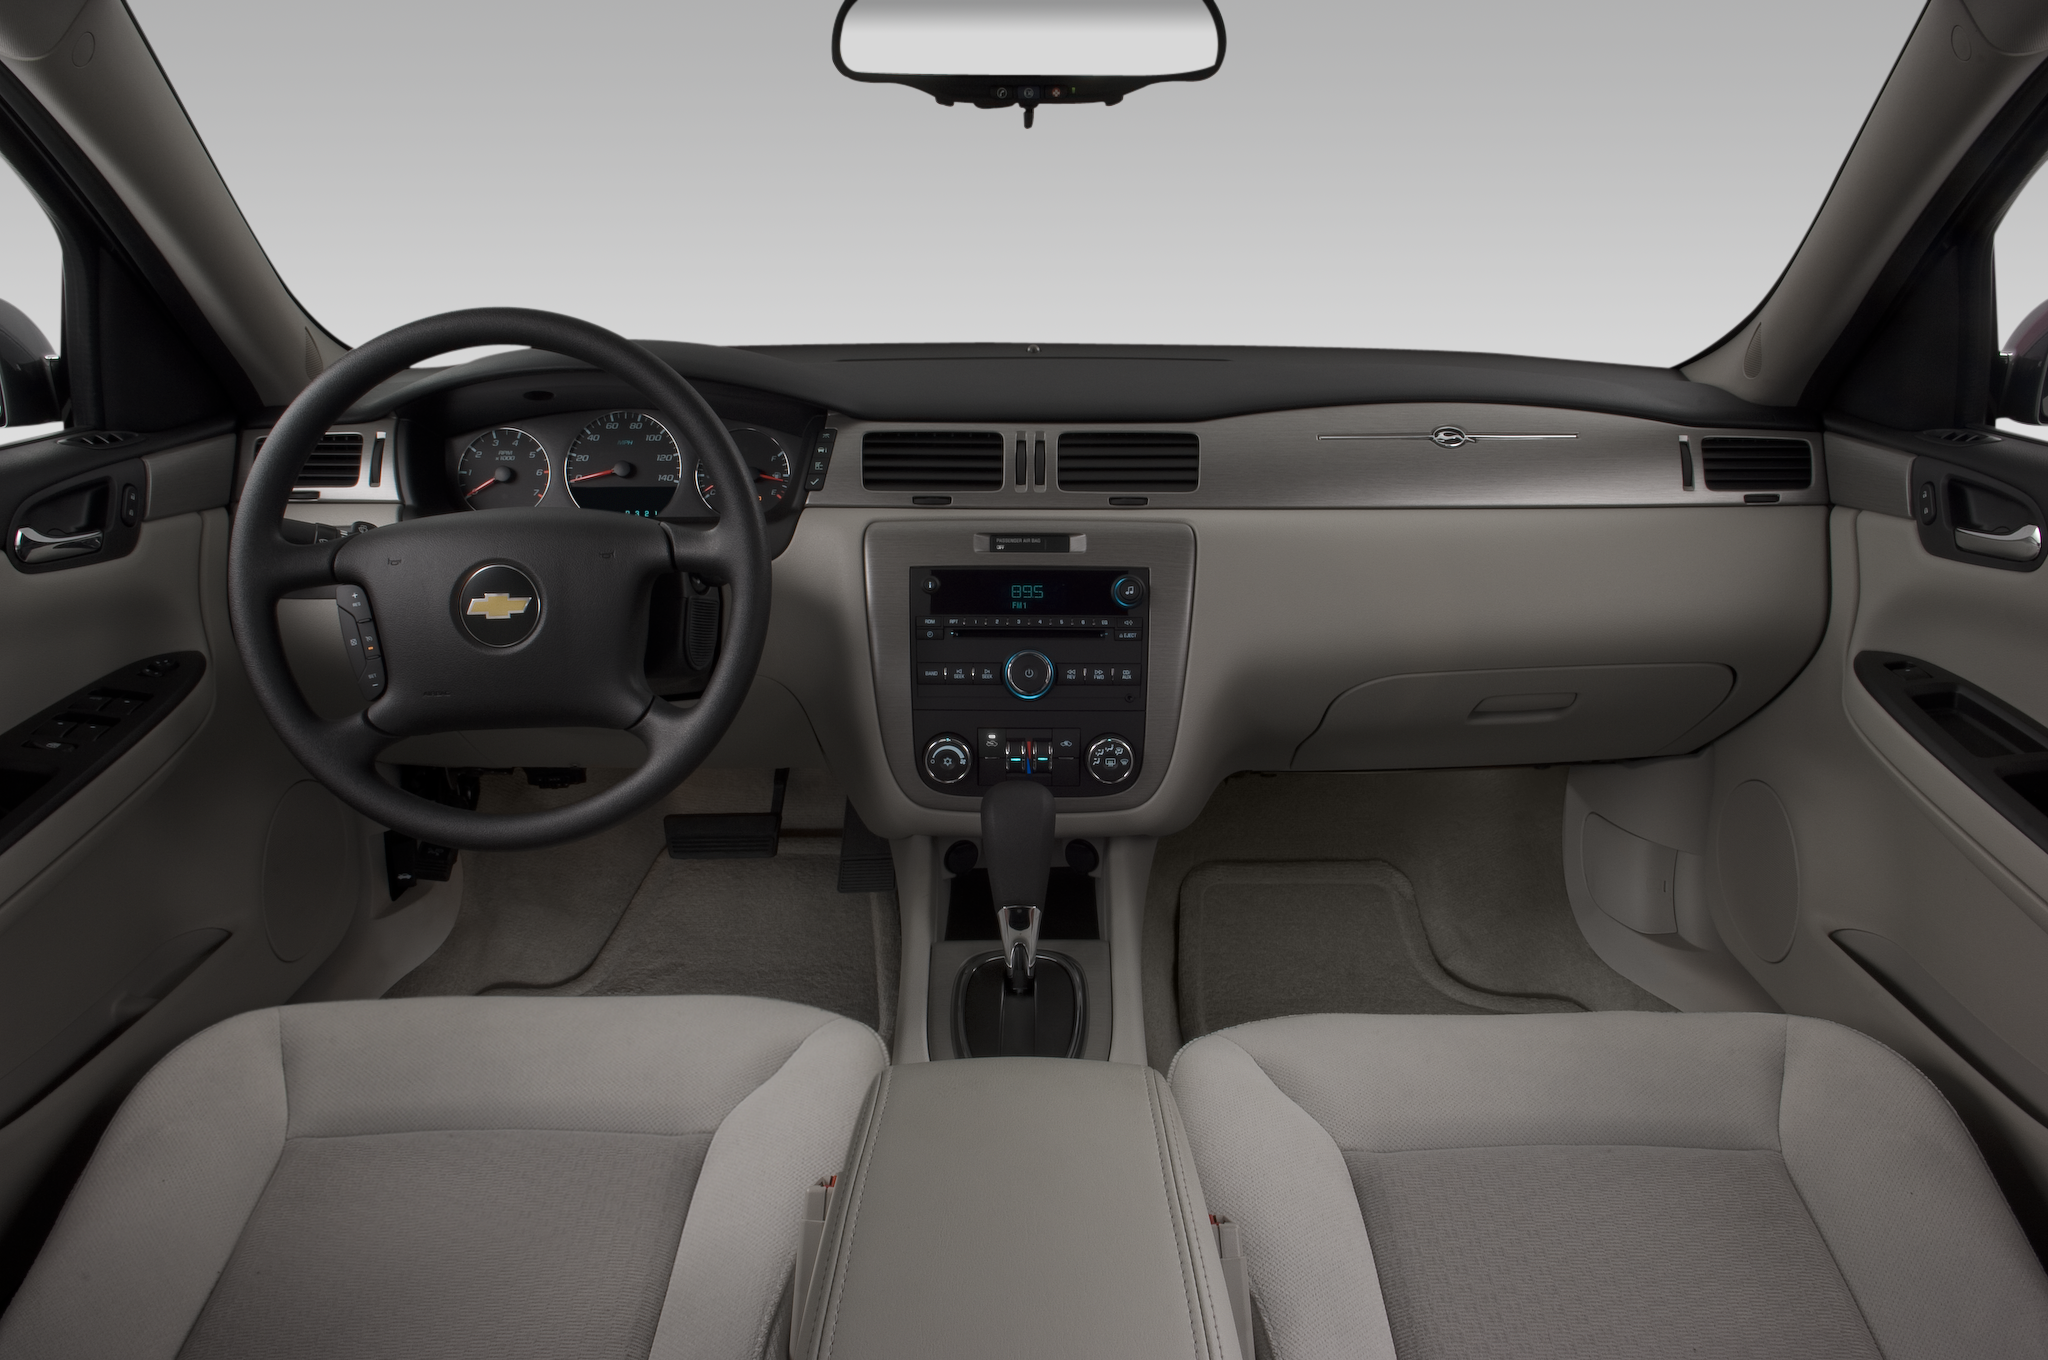 Next Gen Chevrolet Impala To Be Built Alongside Malibu Volt In Detroit